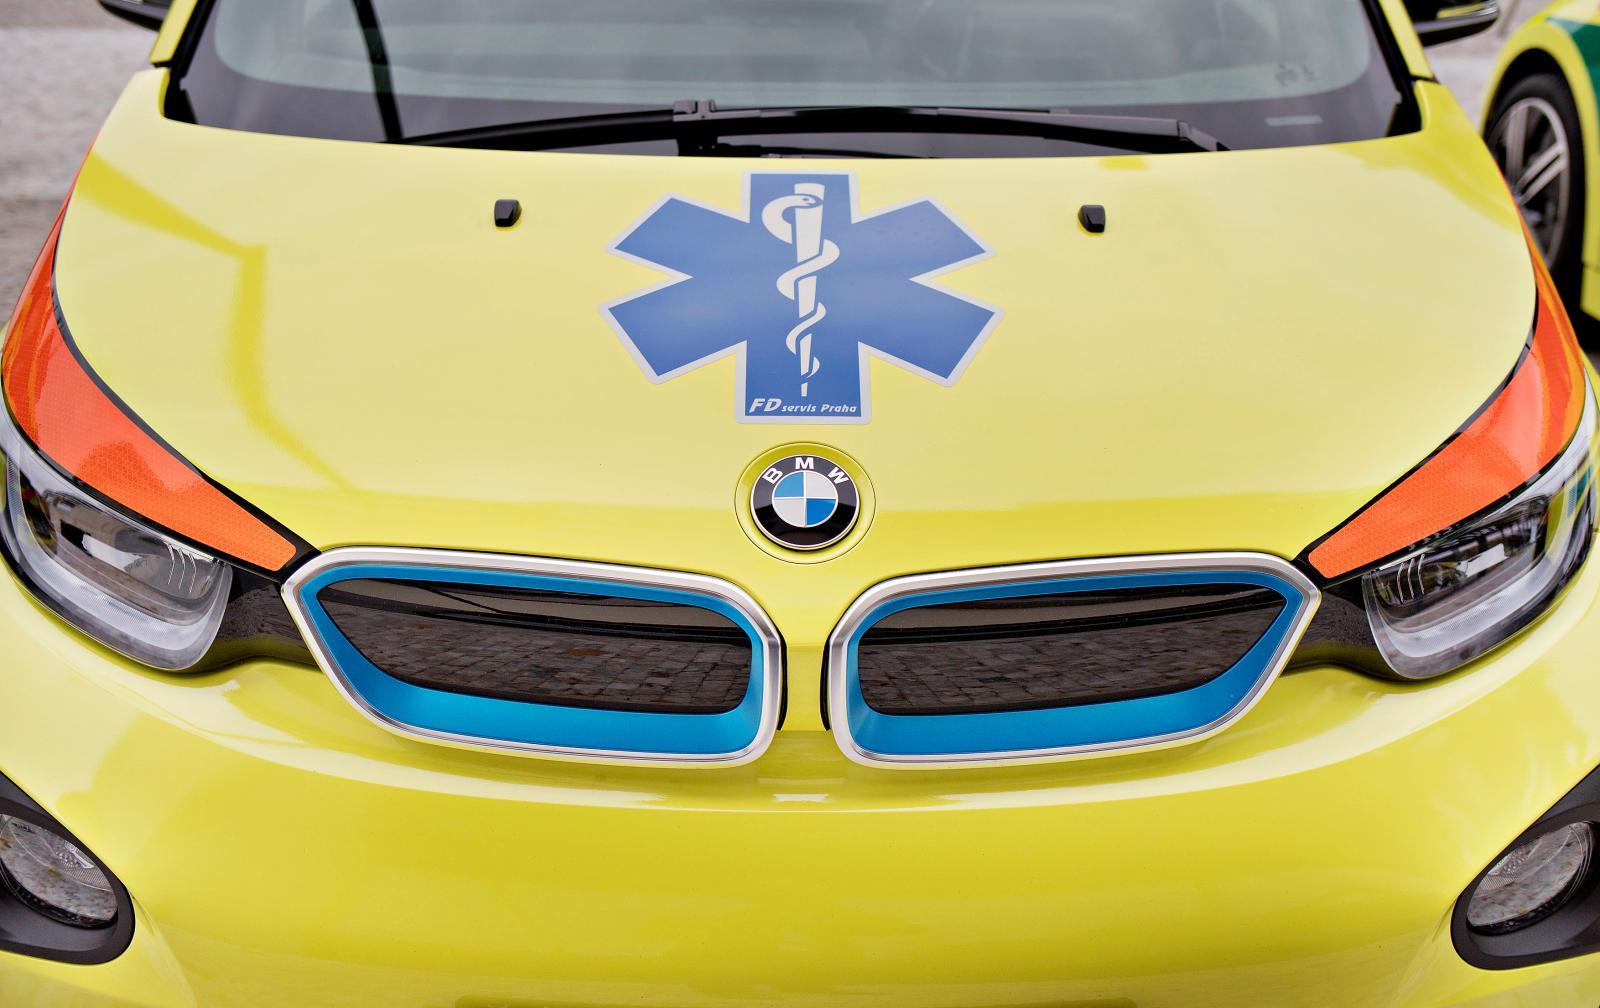 elektromobil-bmw-i3-zachranna-zdravotnicka-sluzba- (7)